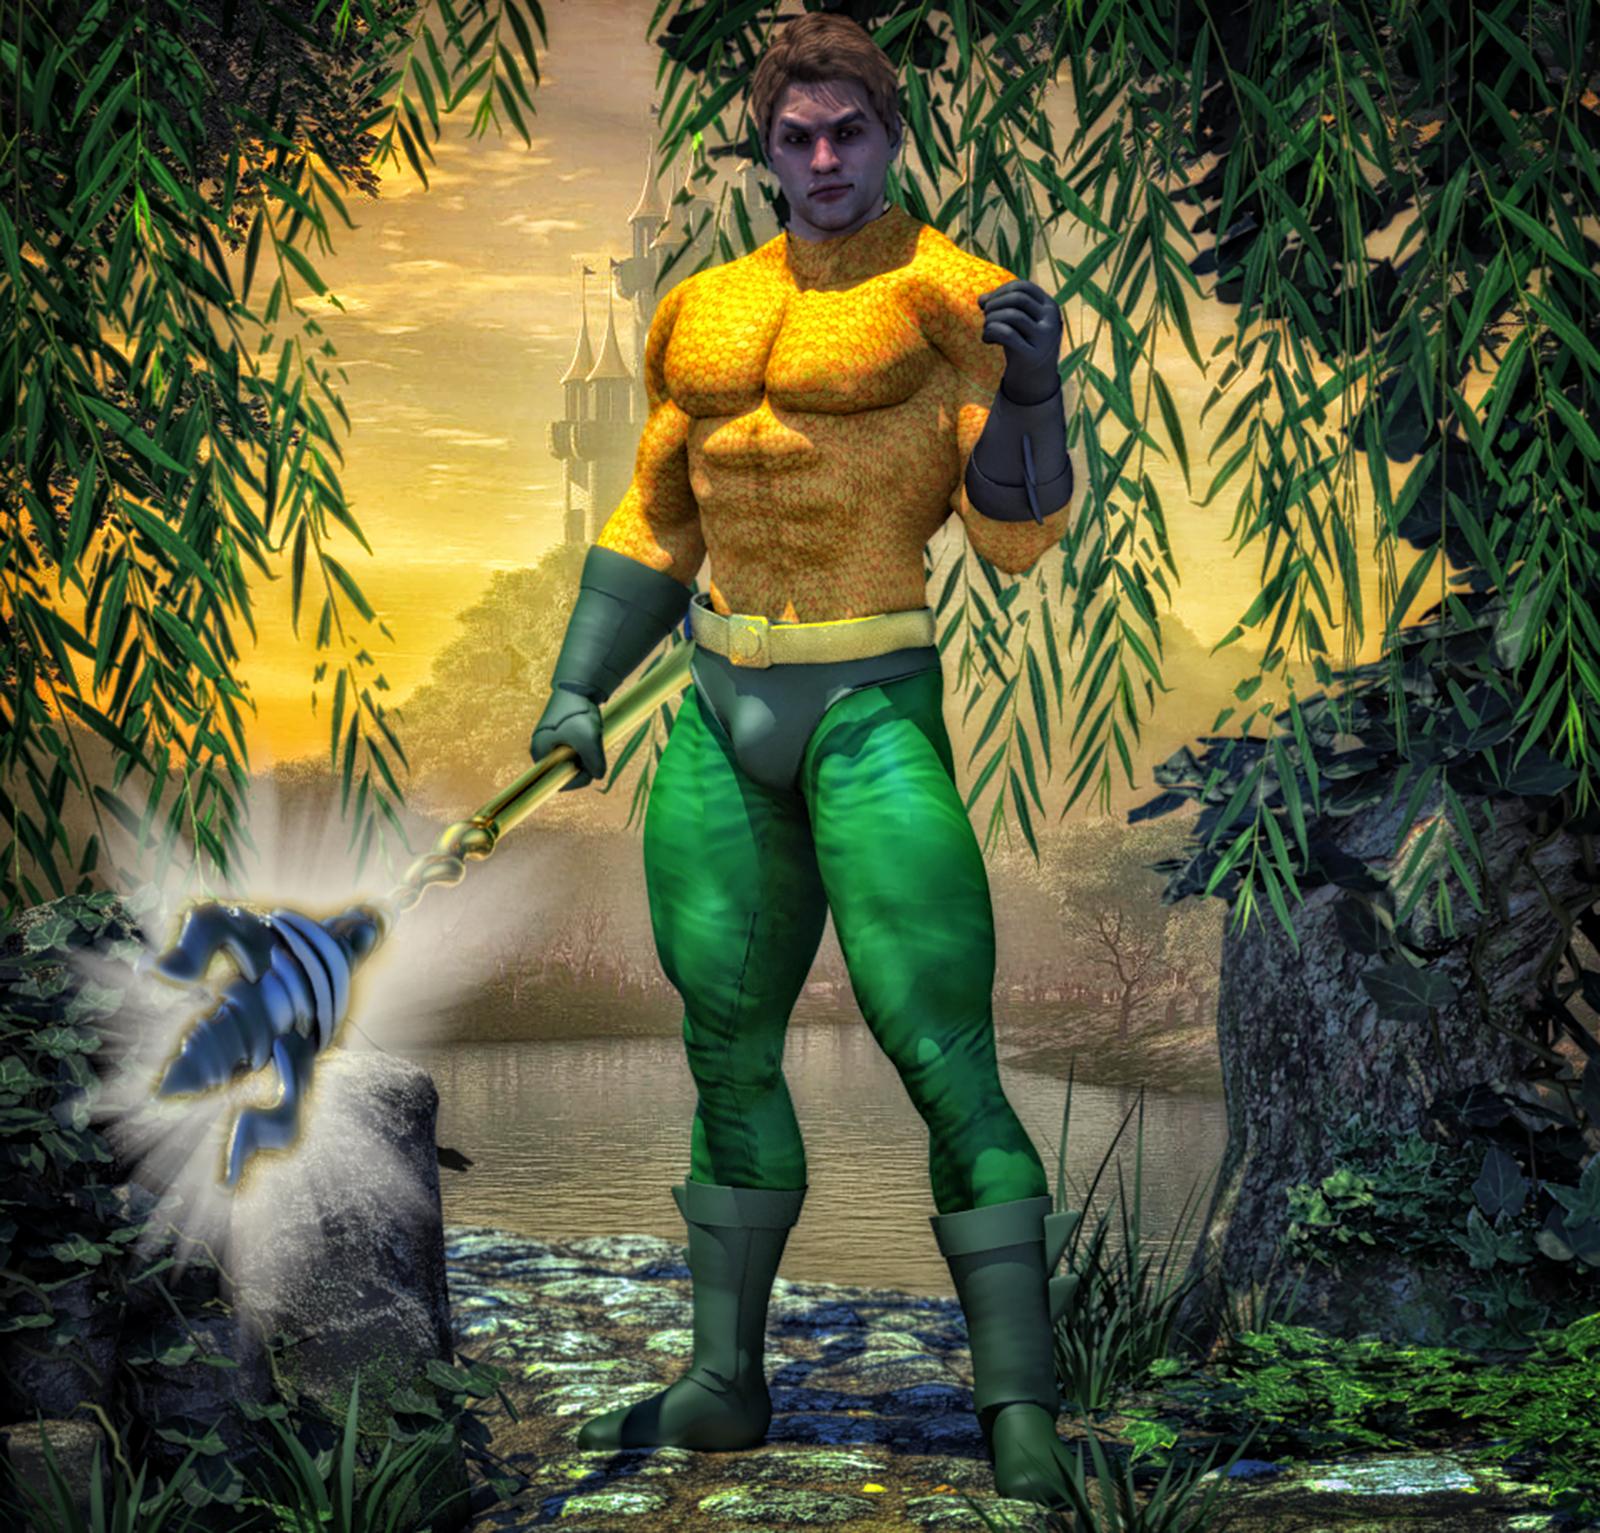 Aquaman classic second skin textures x M4